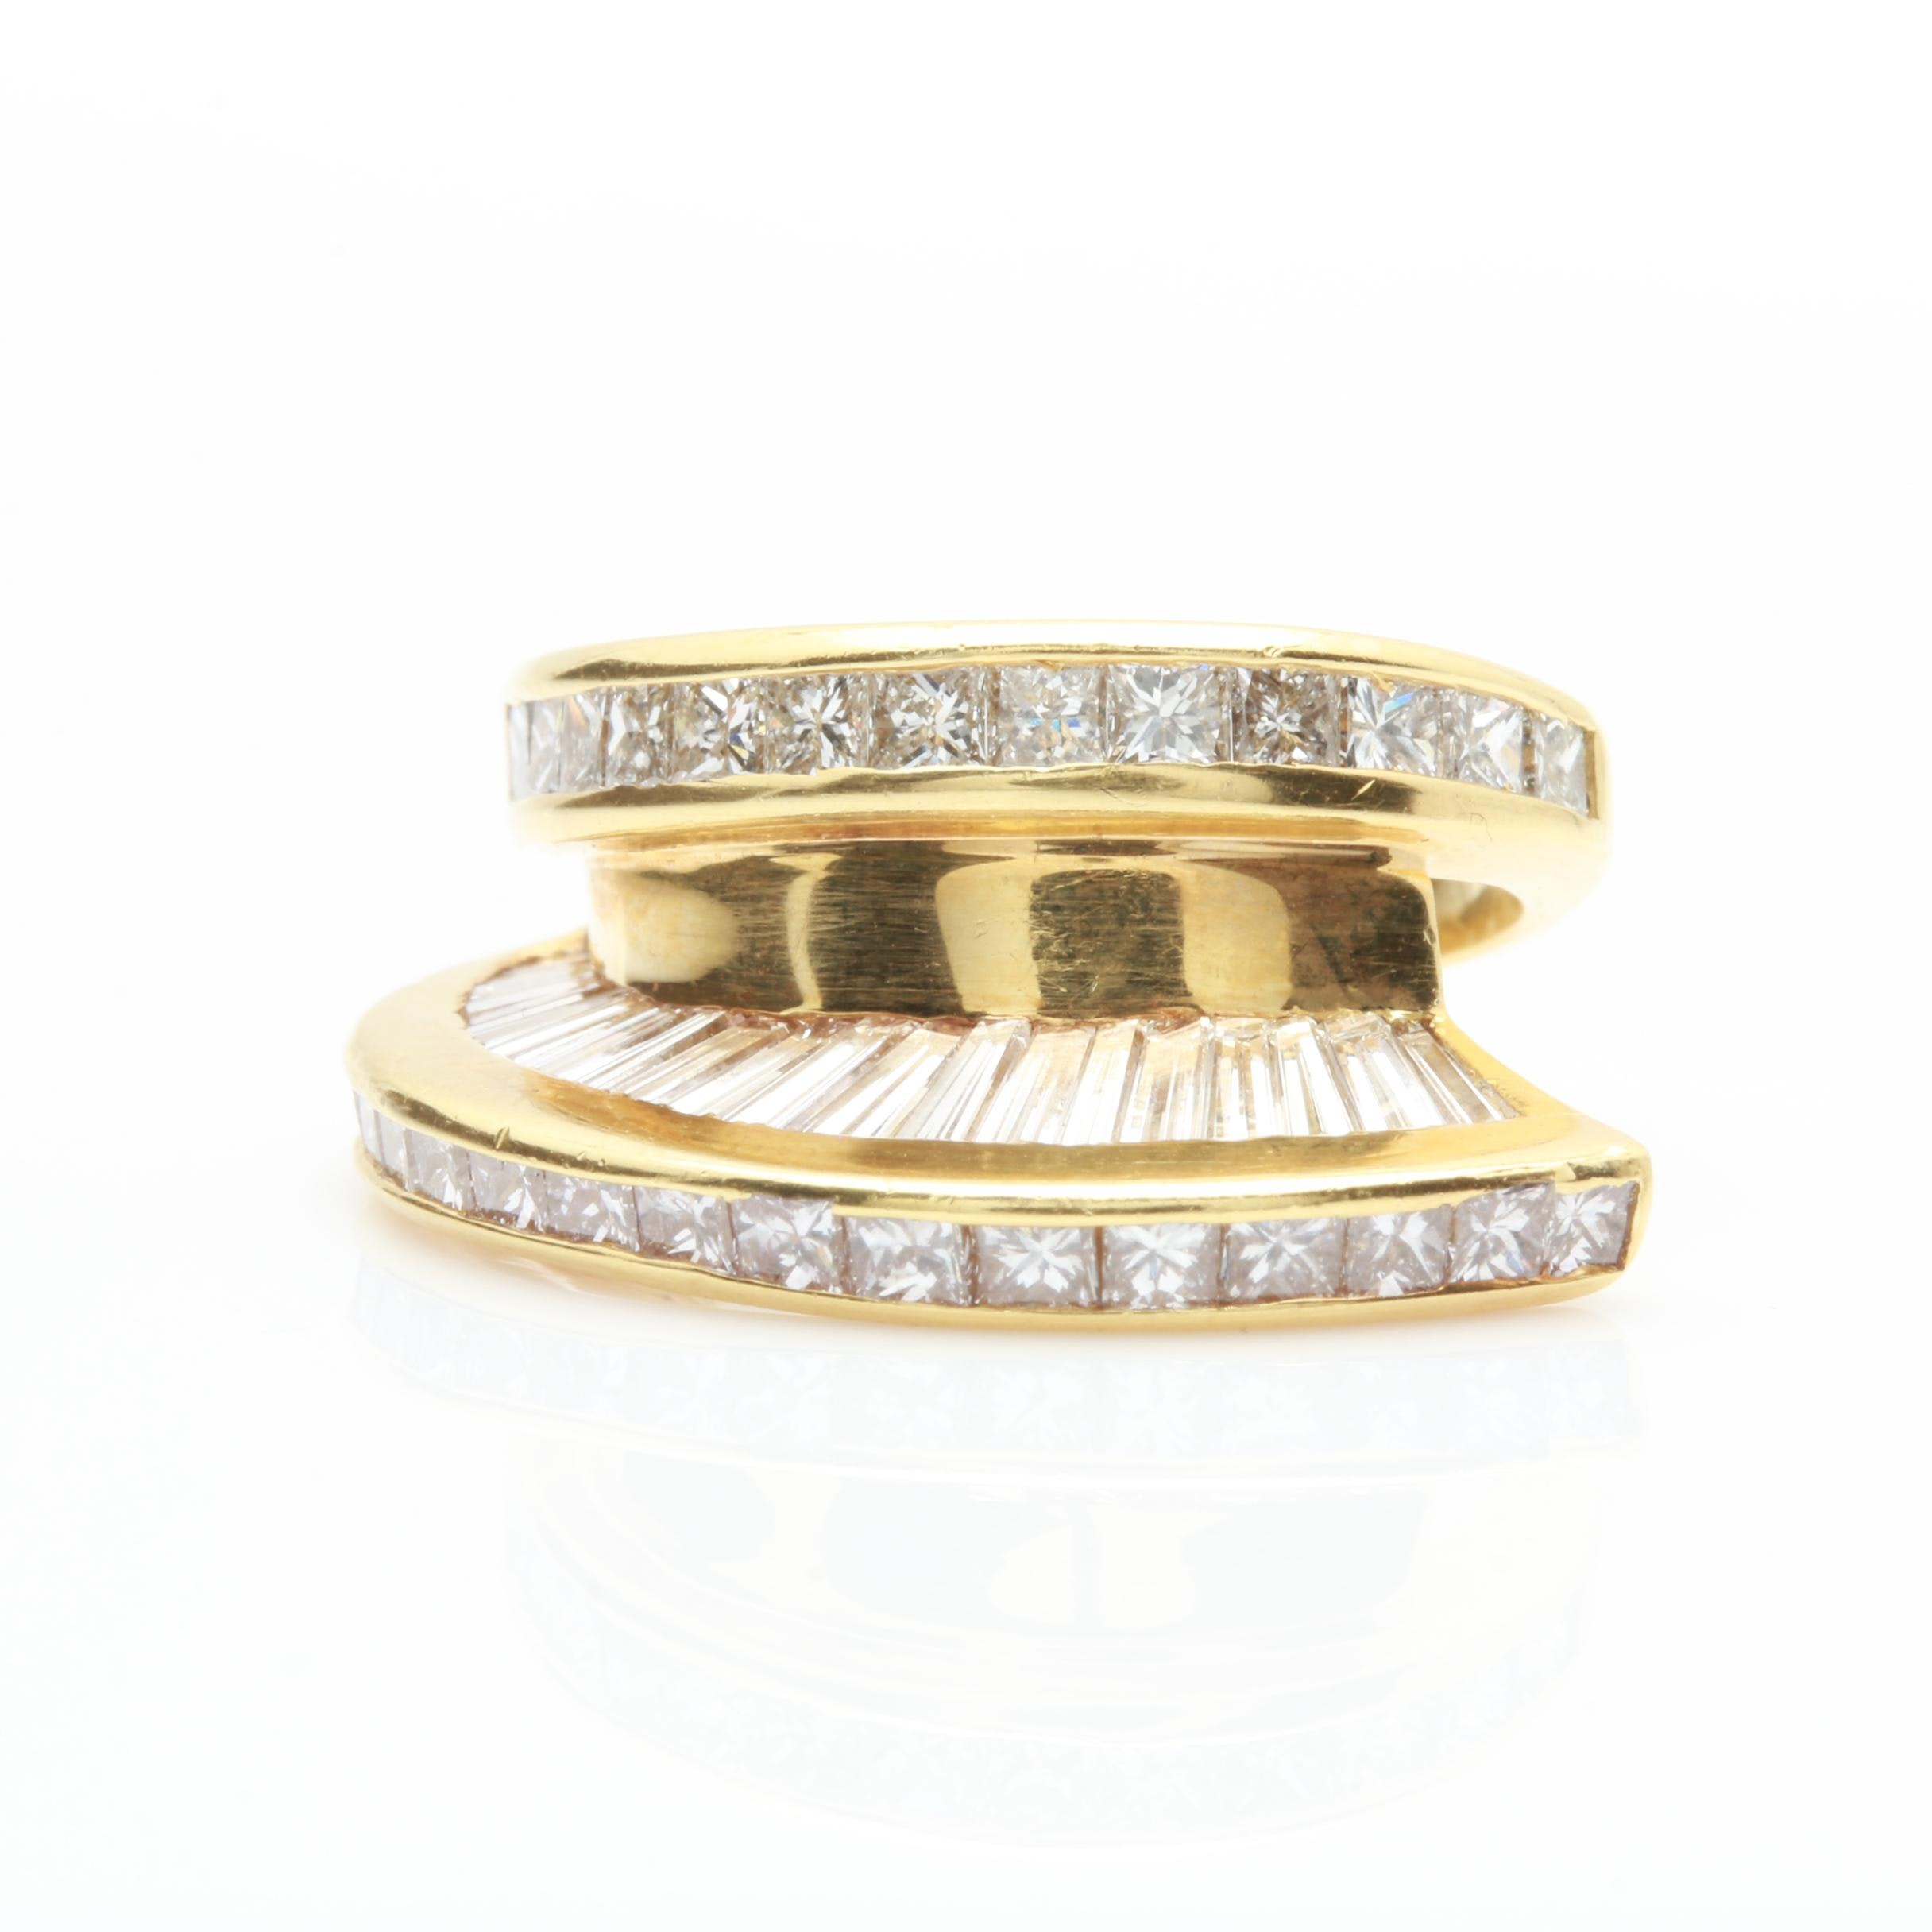 18K Yellow Gold 3.50 CTW Diamond Ring